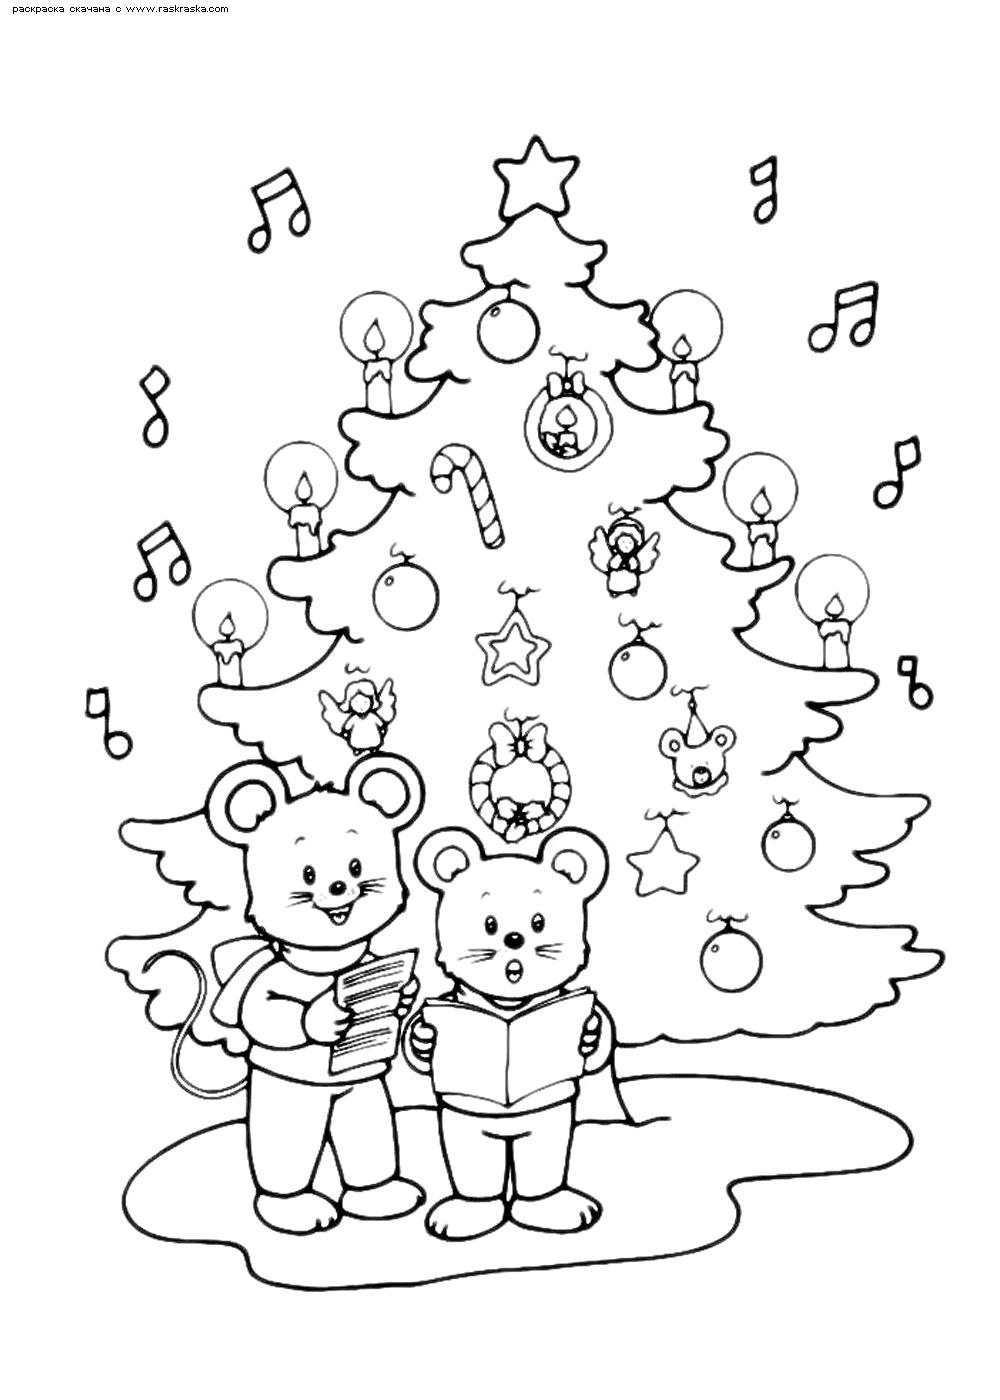 Раскраска Мышки у елка | Раскраски мышей, символа 2020 ...